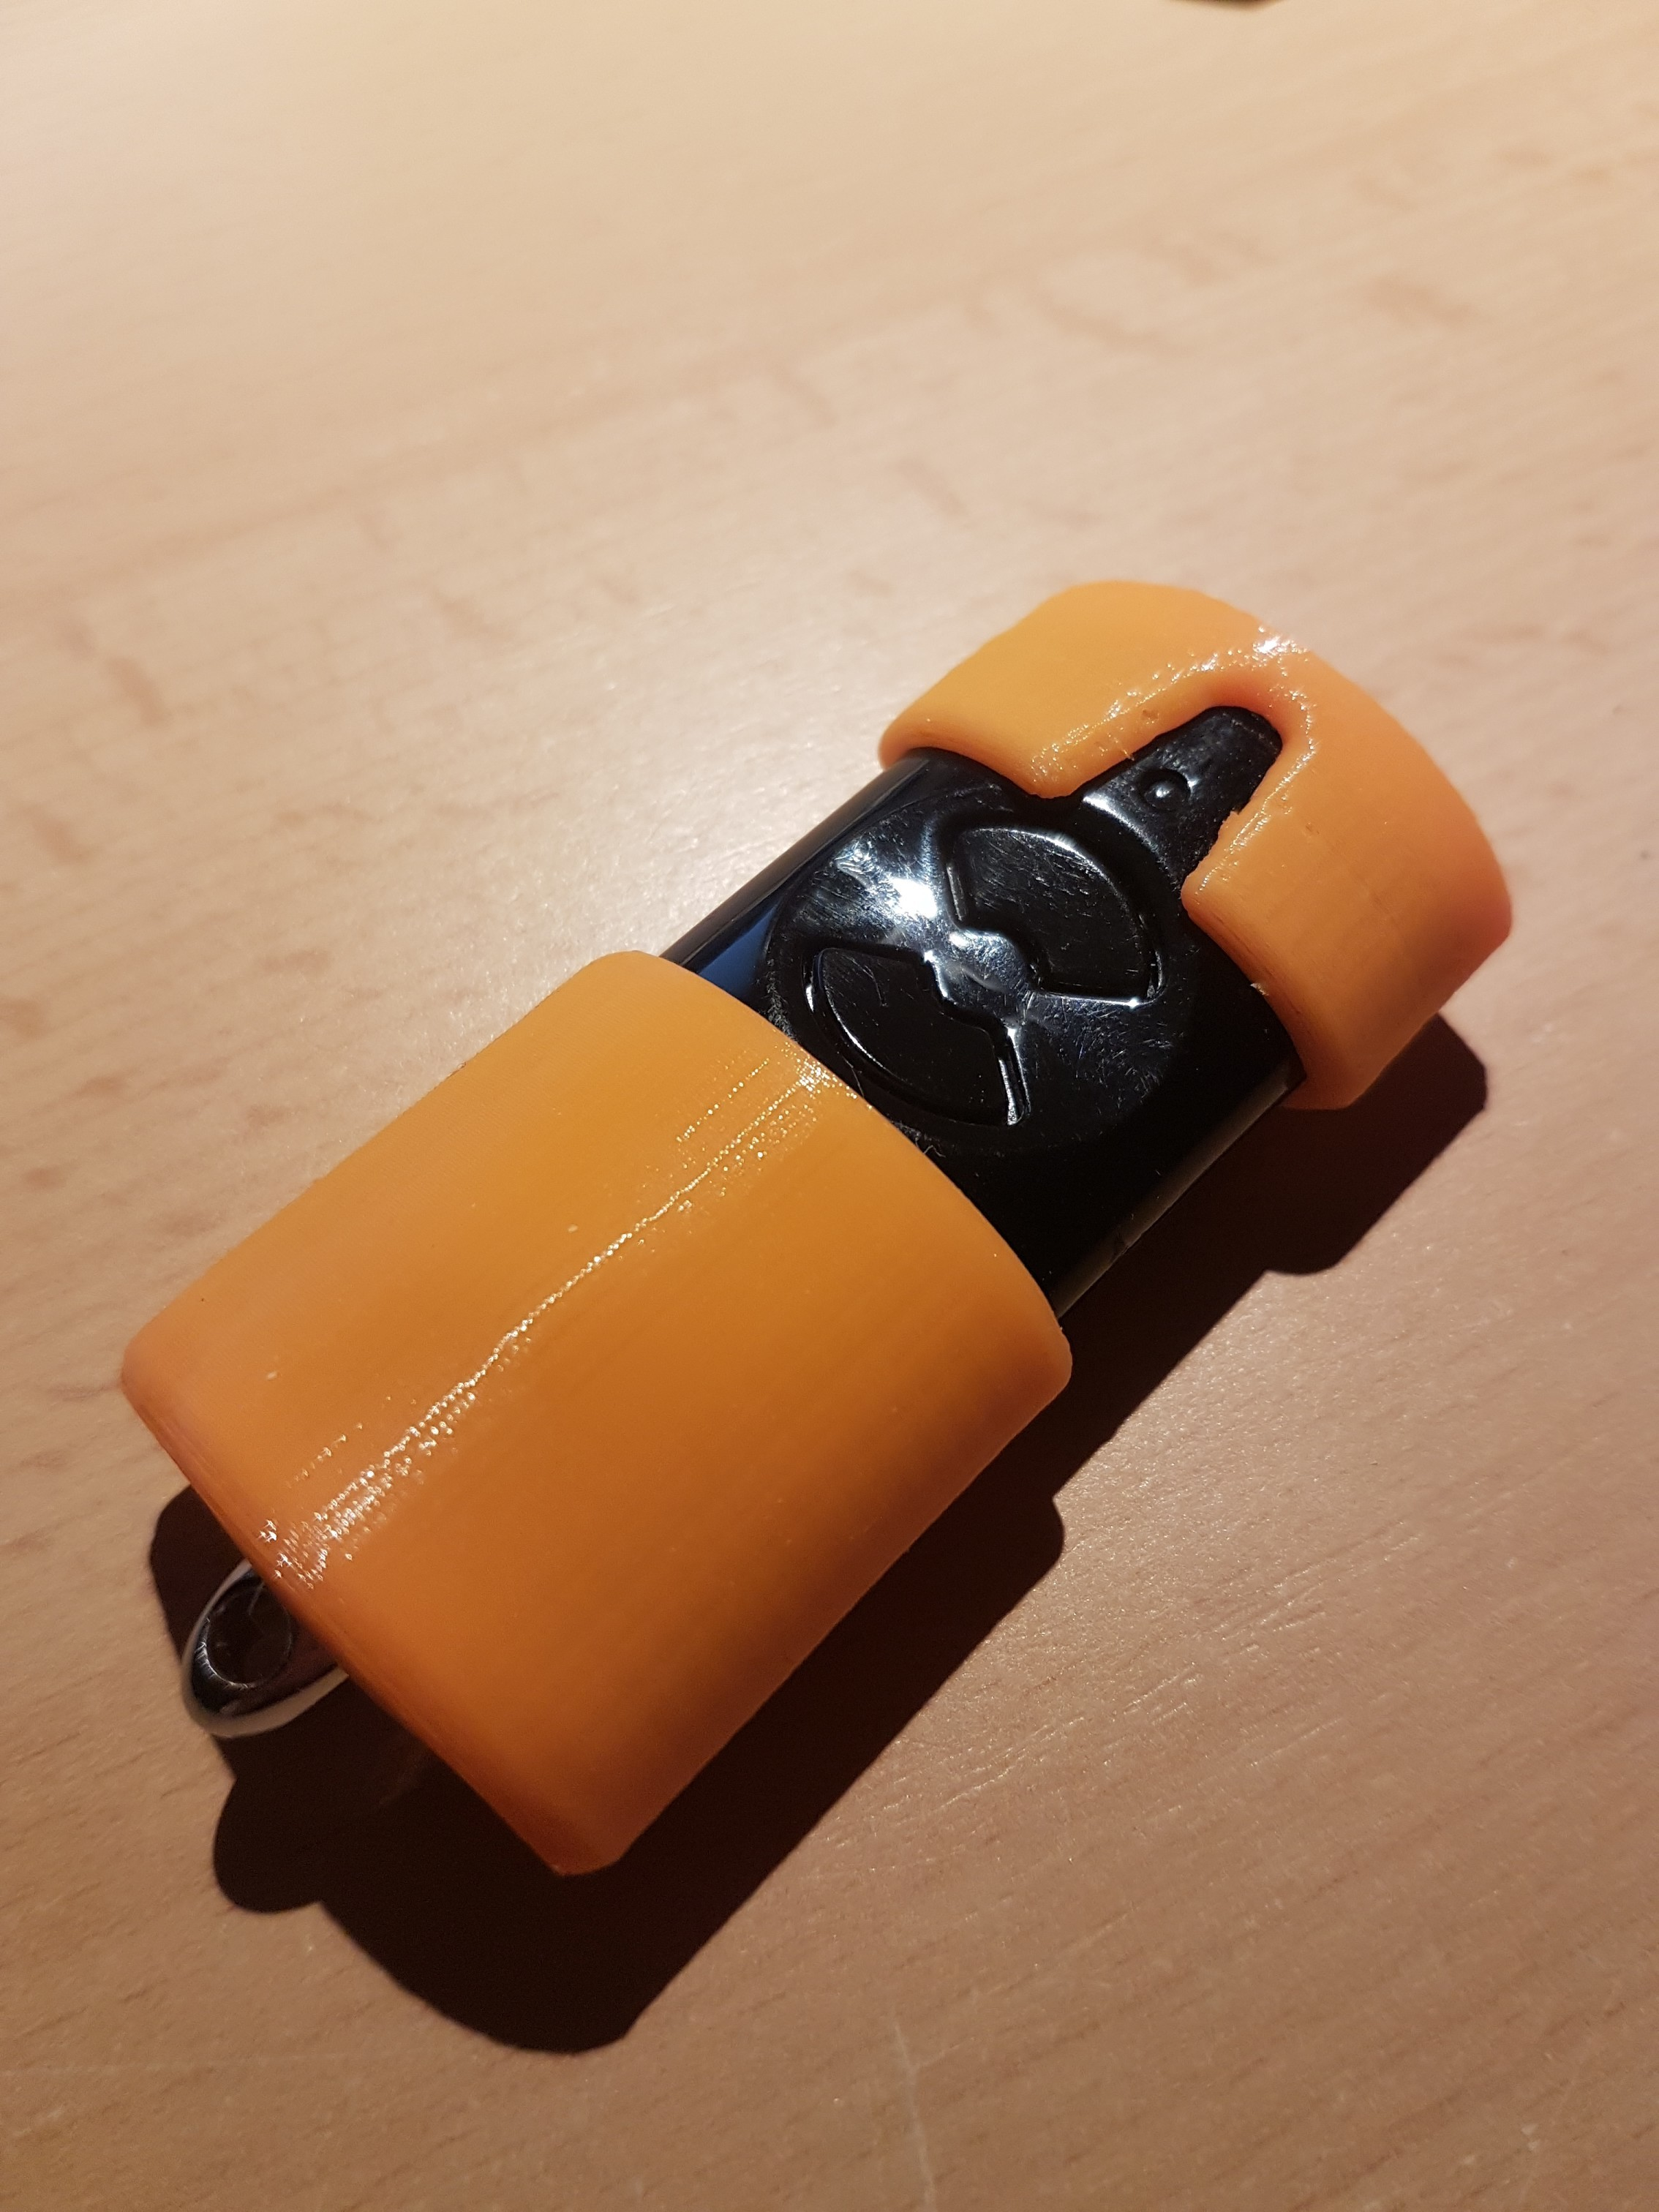 hormann.jpg Download free STL file Hormann HSE2-868-BS Protective case • 3D printer template, touchthebitum